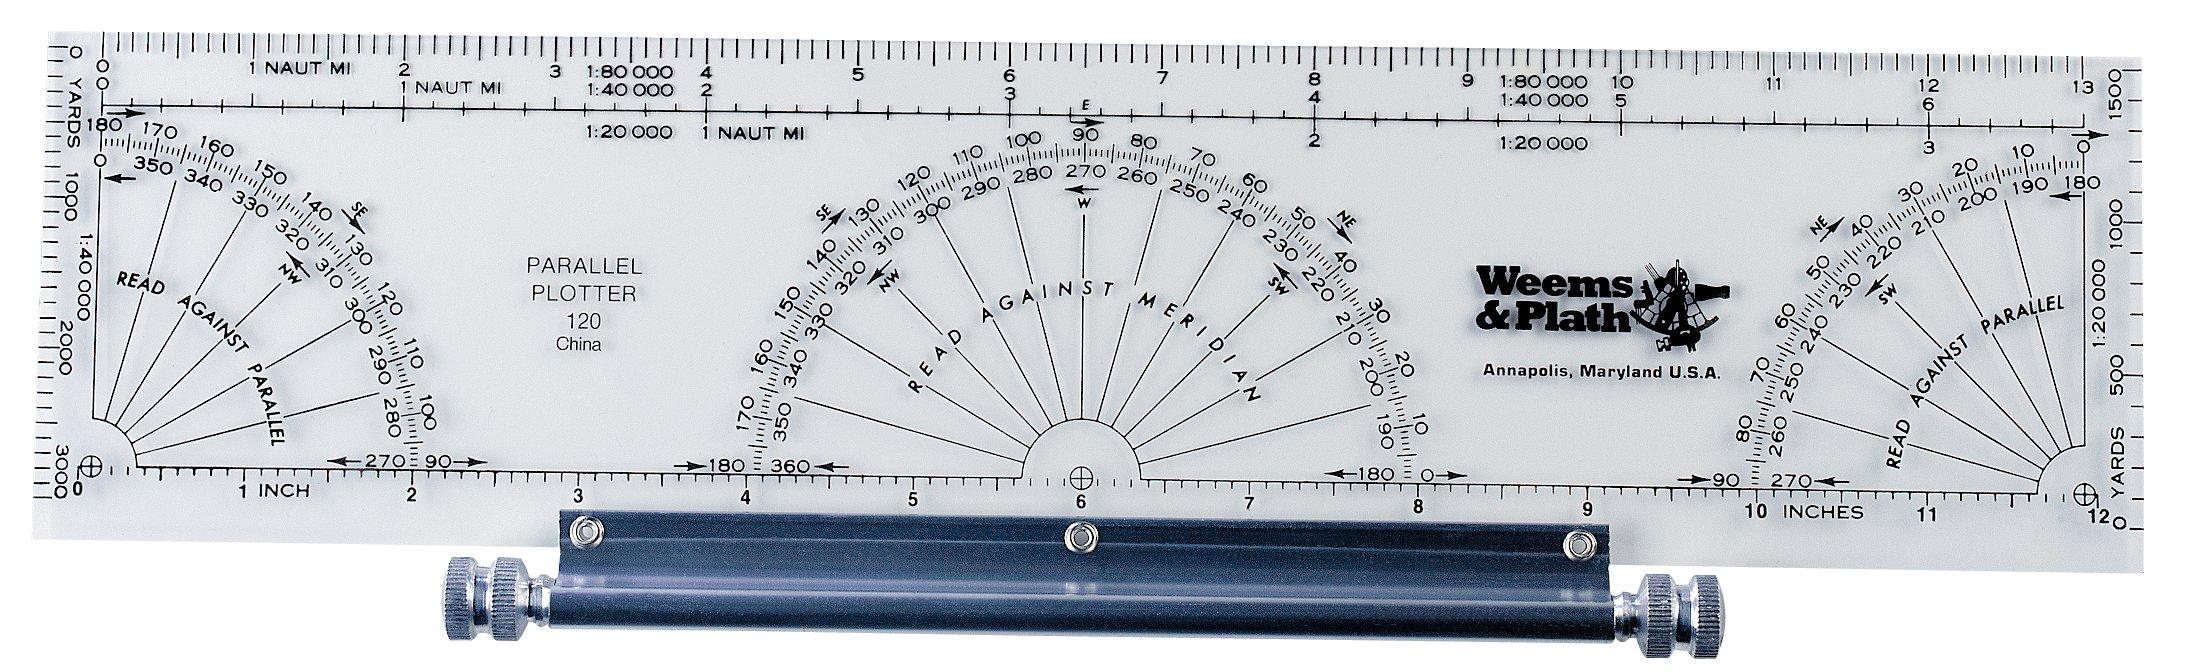 Weems & Plath Marine Navigation Parallel Plotter by Weems & Plath ...